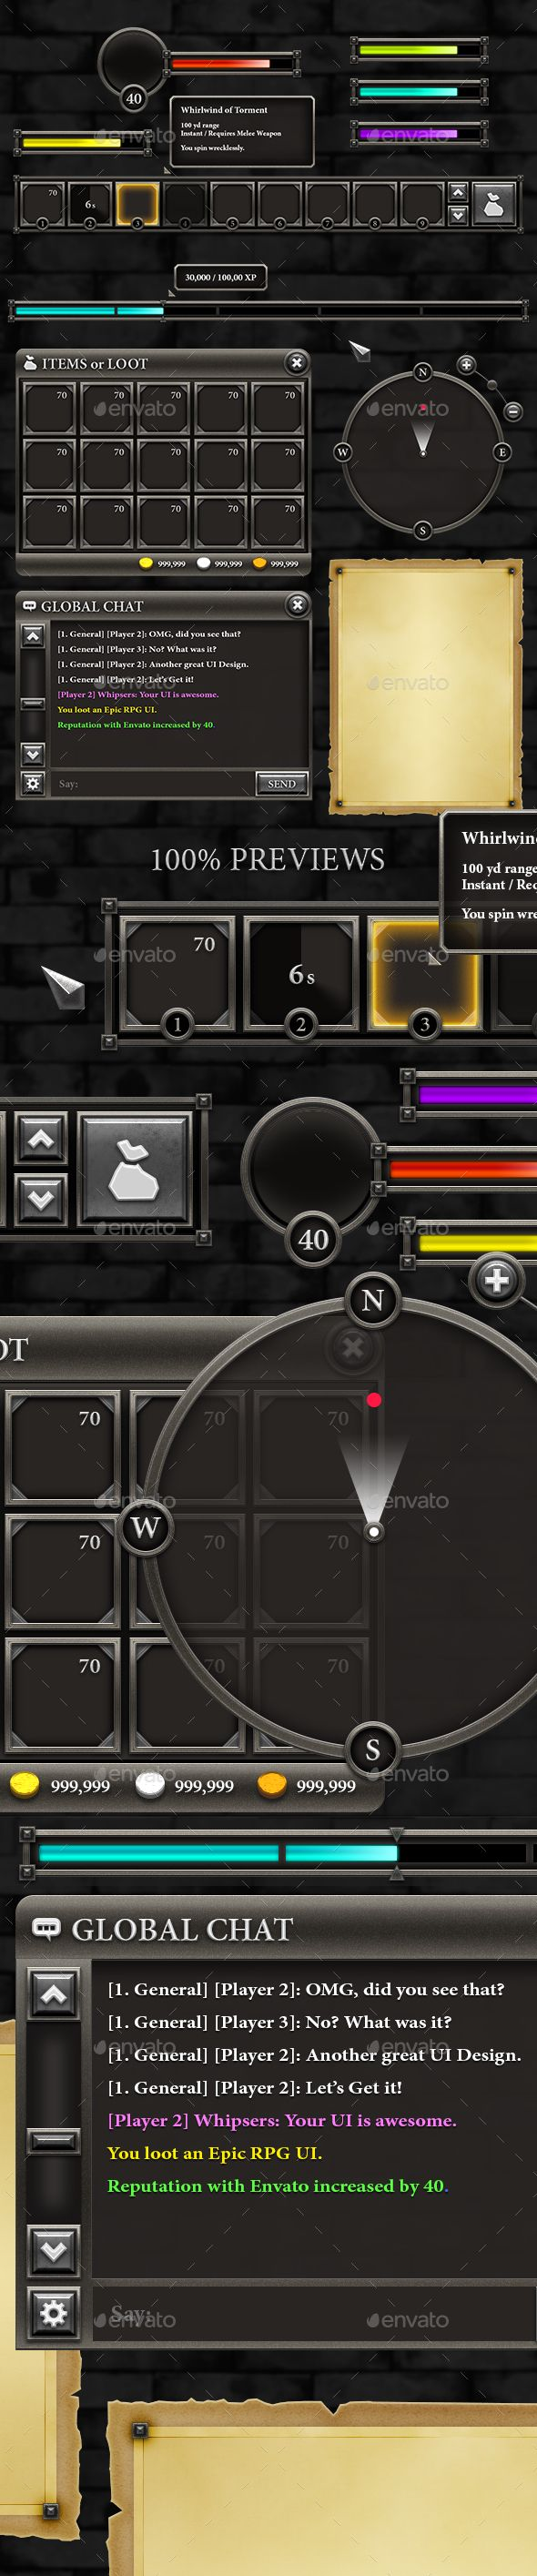 RPG User Interface Download here: https://graphicriver.net/item/rpg-user-interface/15889405?ref=KlitVogli